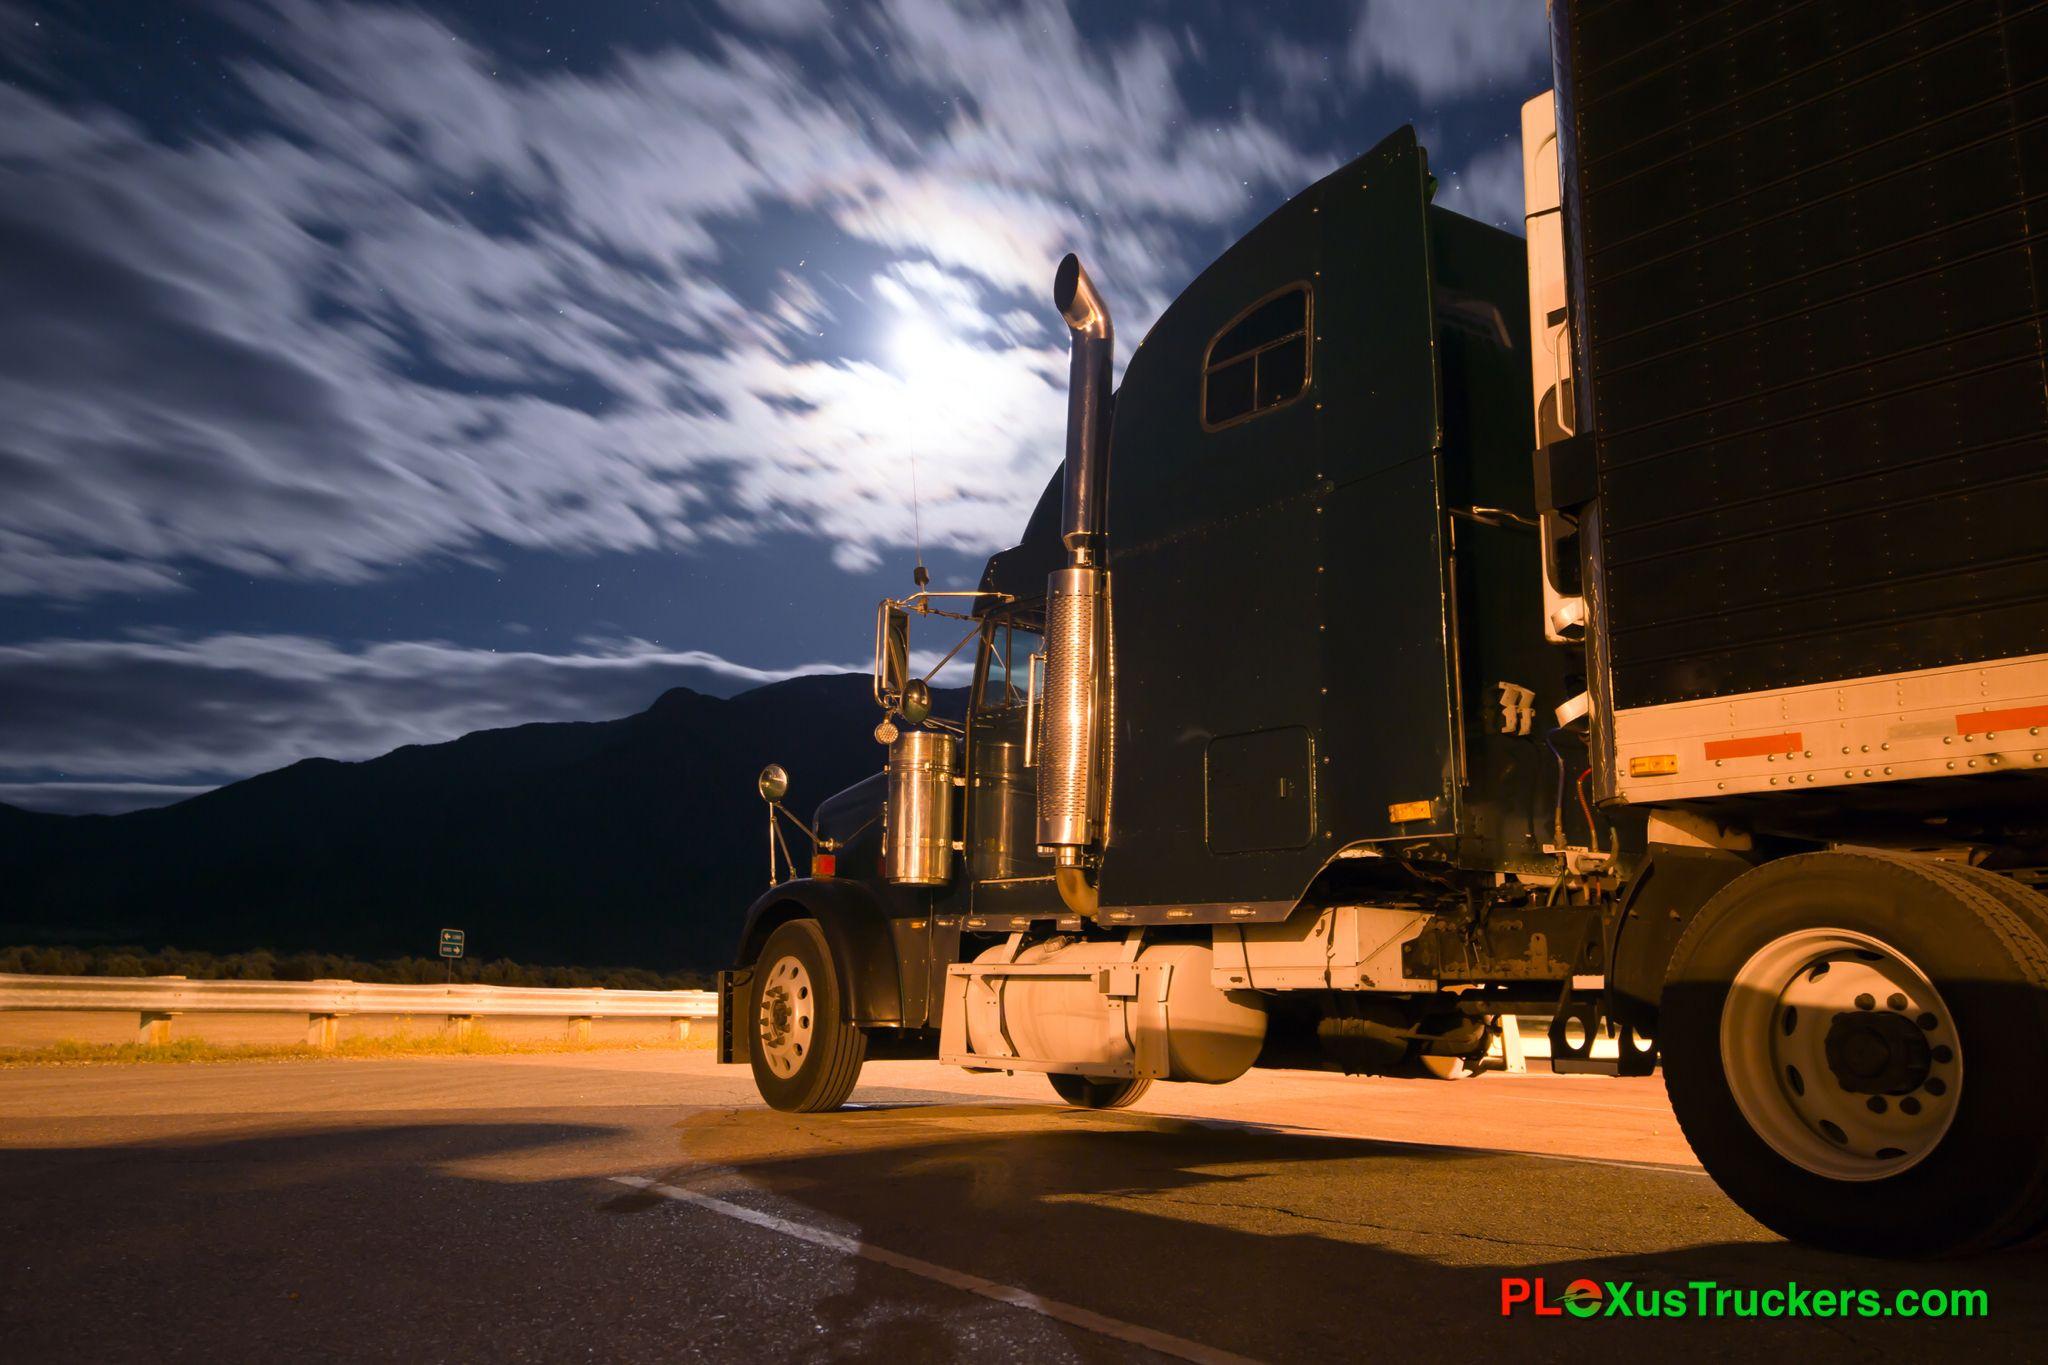 Today's PlexusTruckers photo enjoy! Trucking Truckers